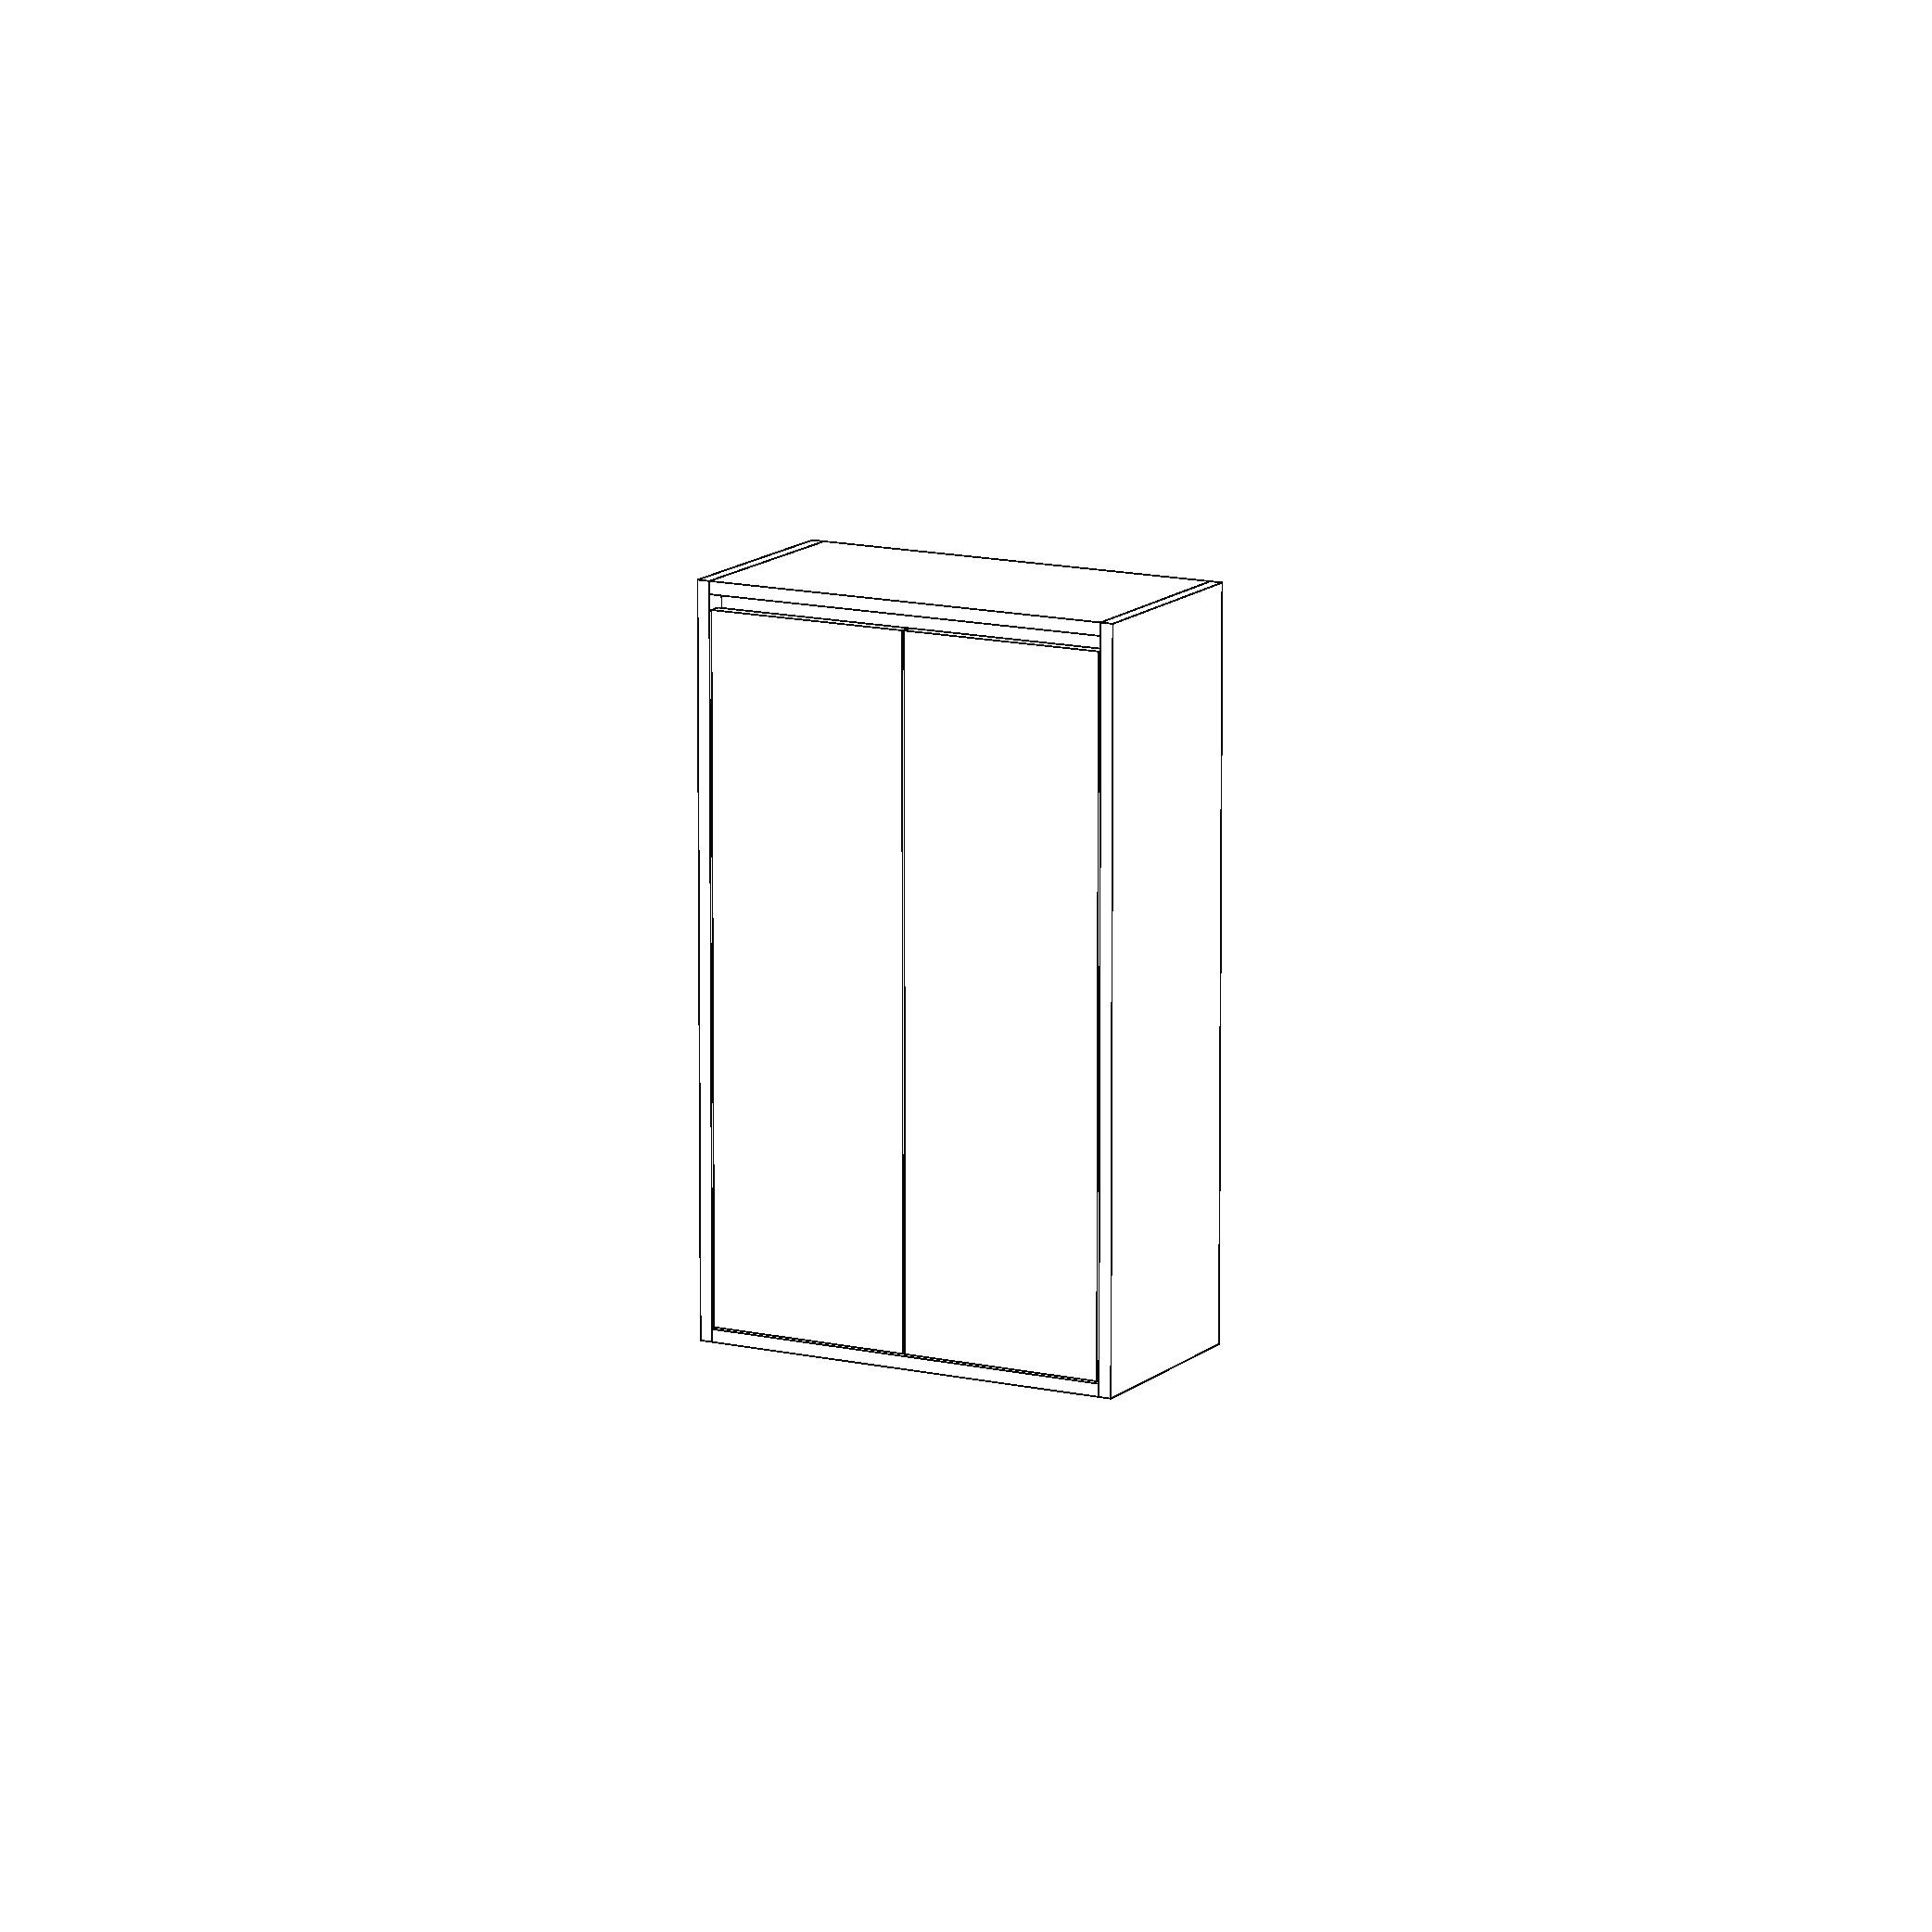 STASH 3/6